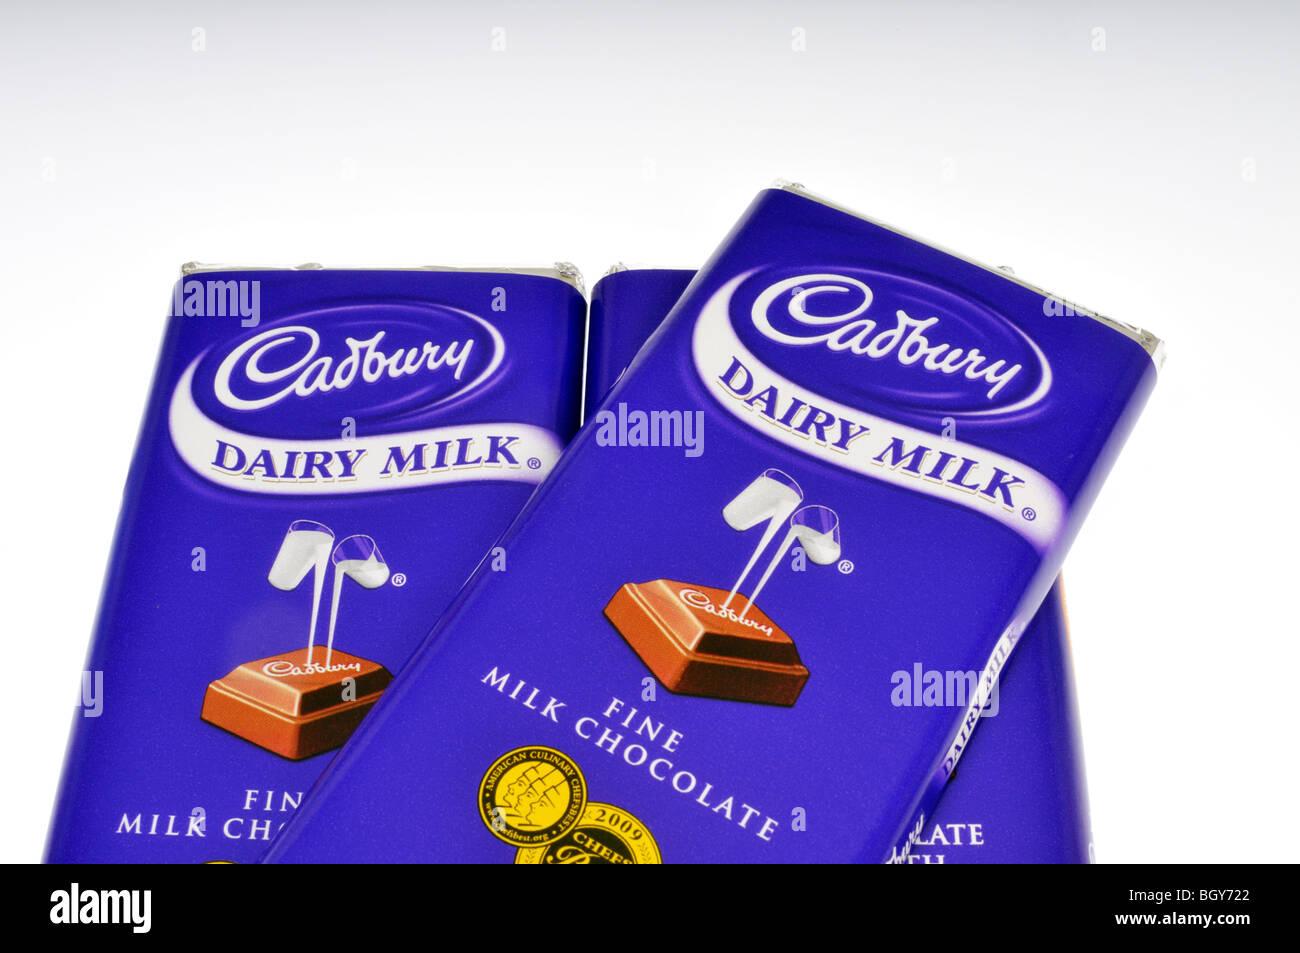 3 barras de caramelo de chocolate Cadbury en contenedores sobre fondo blanco. Foto de stock